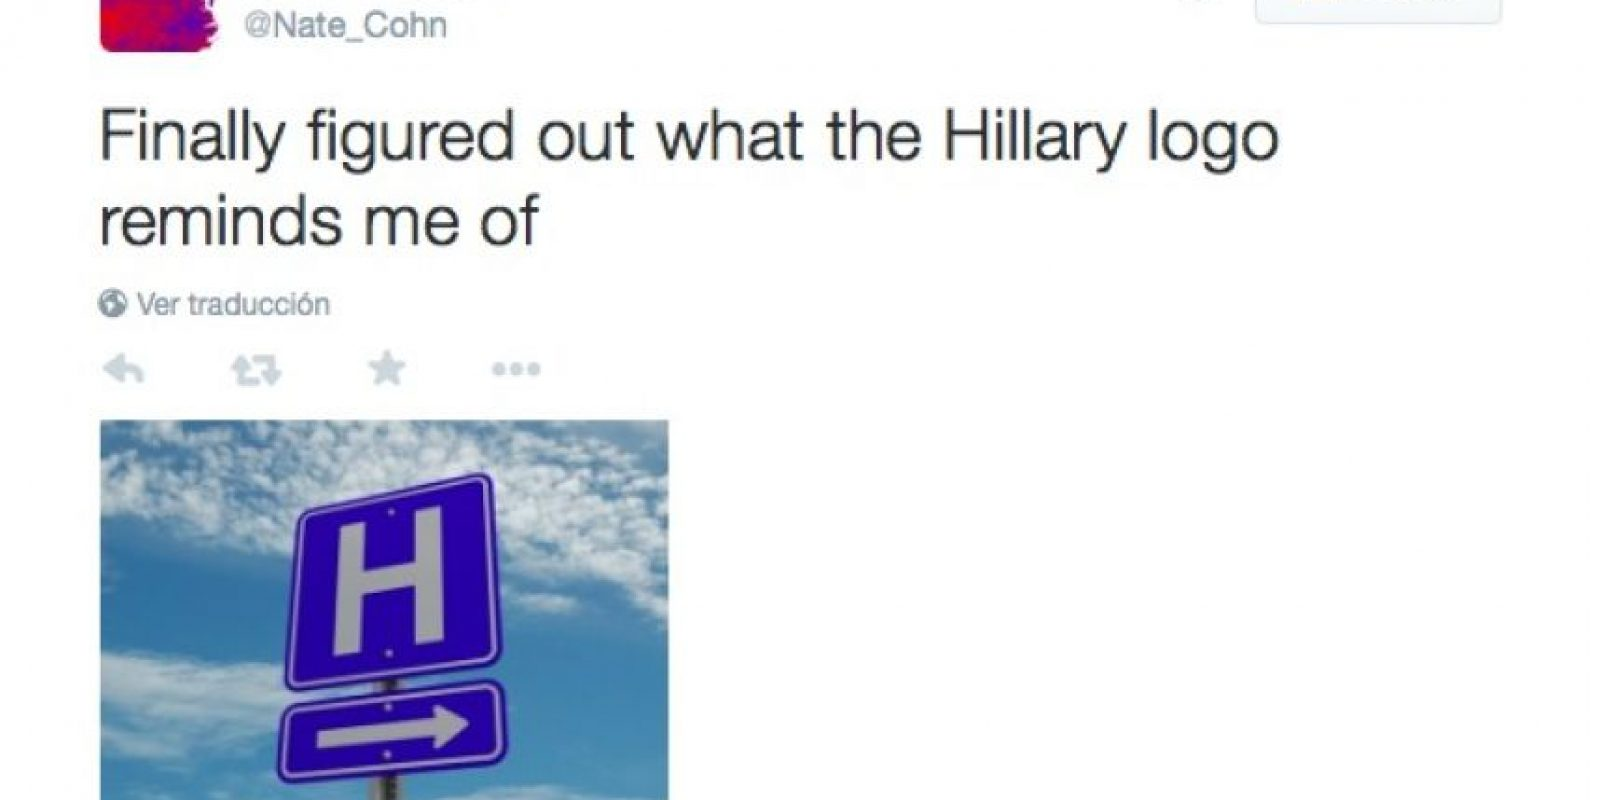 """Por fin descubrí a qué me recuerda el logotipo de Hillary Foto:Twitter.com/Nate_cohn"